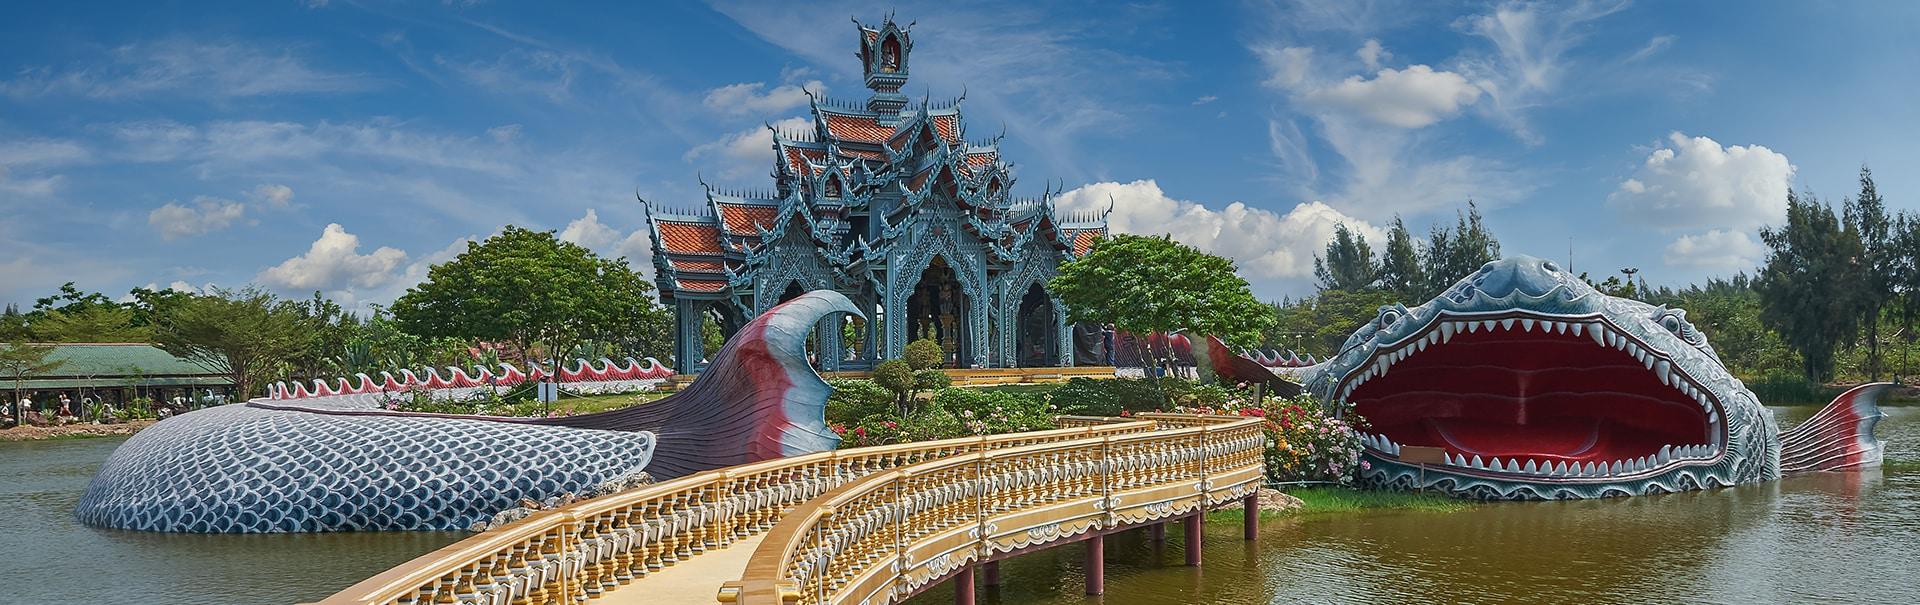 Honeymoon Tour - Bangkok Pattaya with Hua Hin (ASHU) Banner